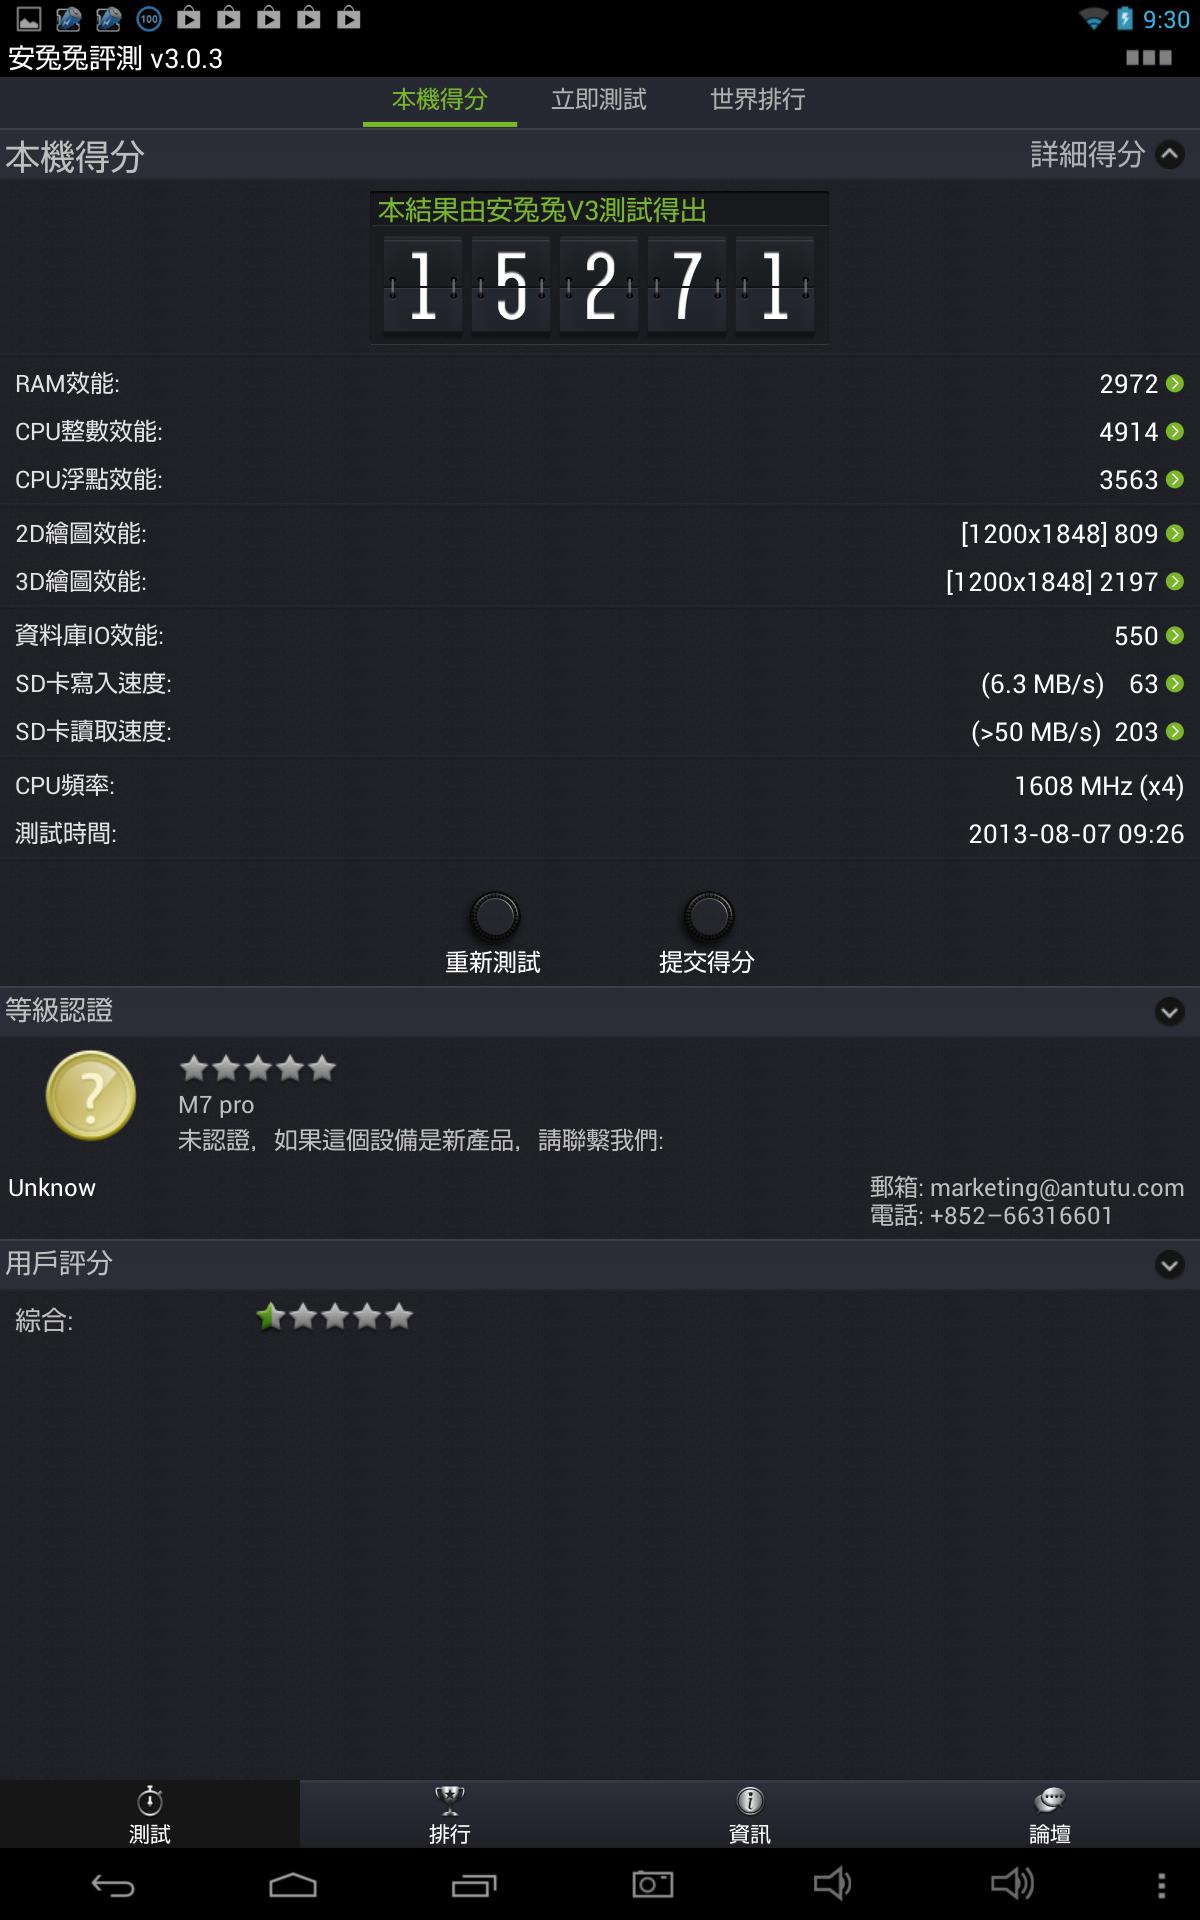 Screenshot_2013-08-07-09-30-49.png